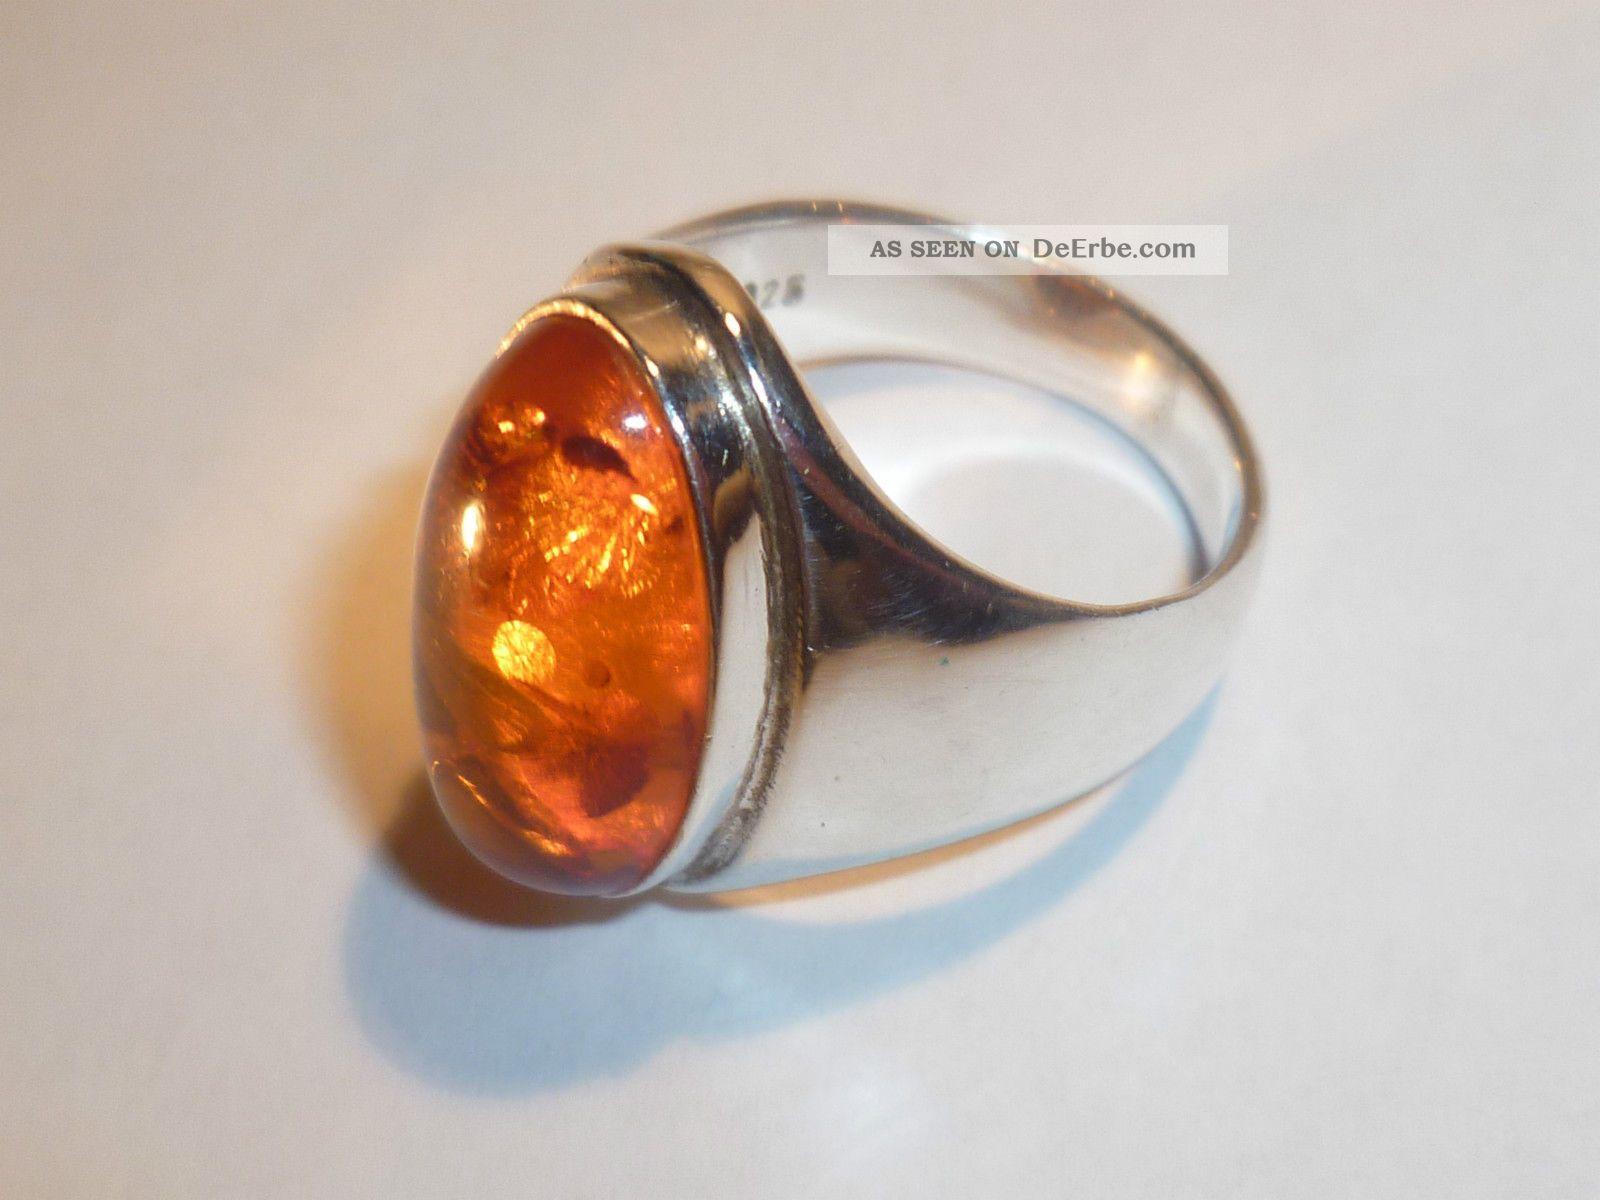 Antikschmuck Schmuck & Accessoires Ringe Silber Antiquitäten